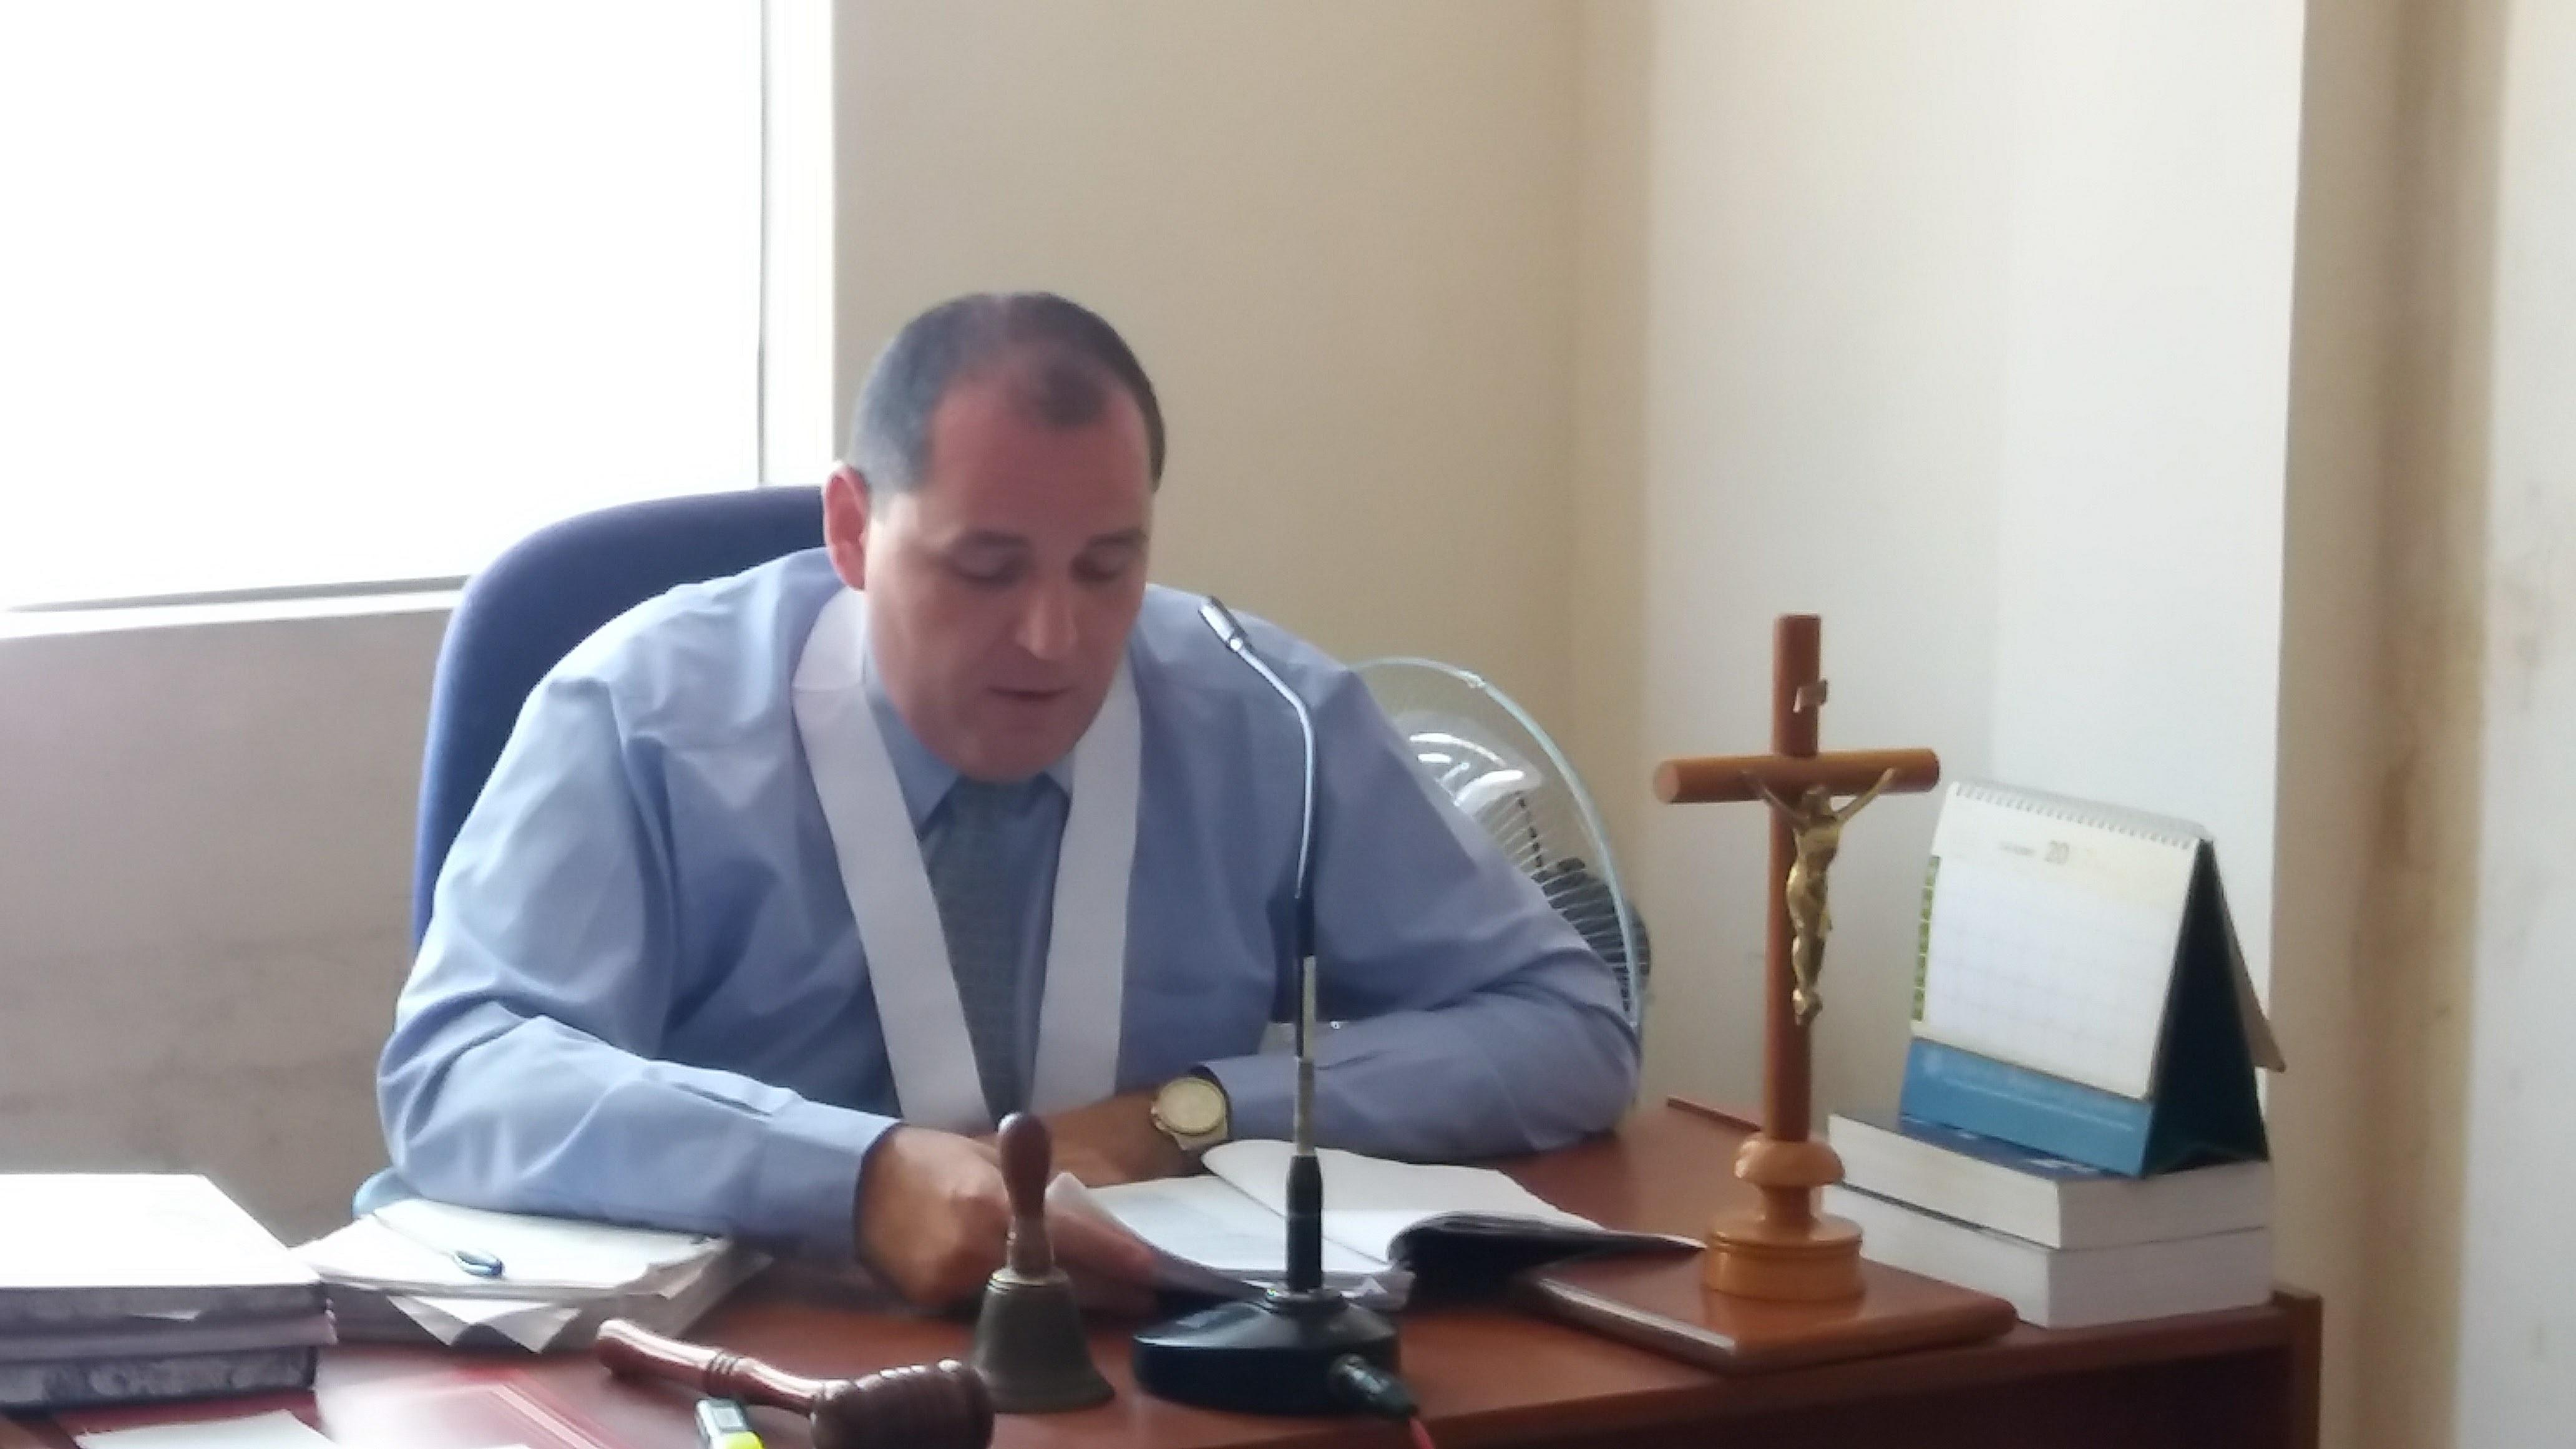 juicio-25-octubre-2017-jequetepeque-4.jpg?mtime=20171026002944#asset:72869